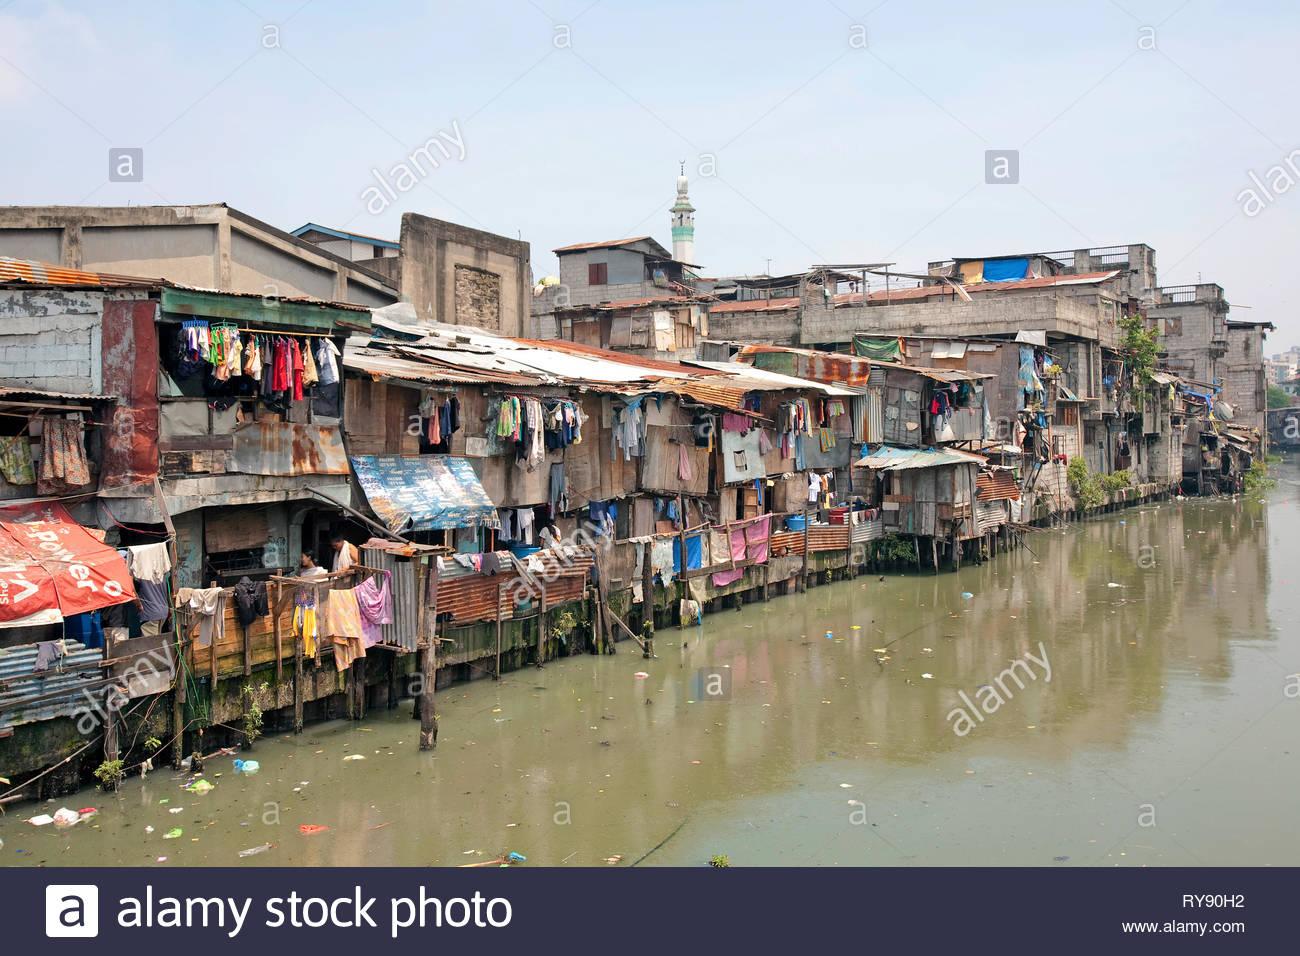 Armenviertel am Pasig Fluss in Manila, Luzon, Philippinen | Slum at Pasig River, Manila, Luzon, Philippines - Stock Image